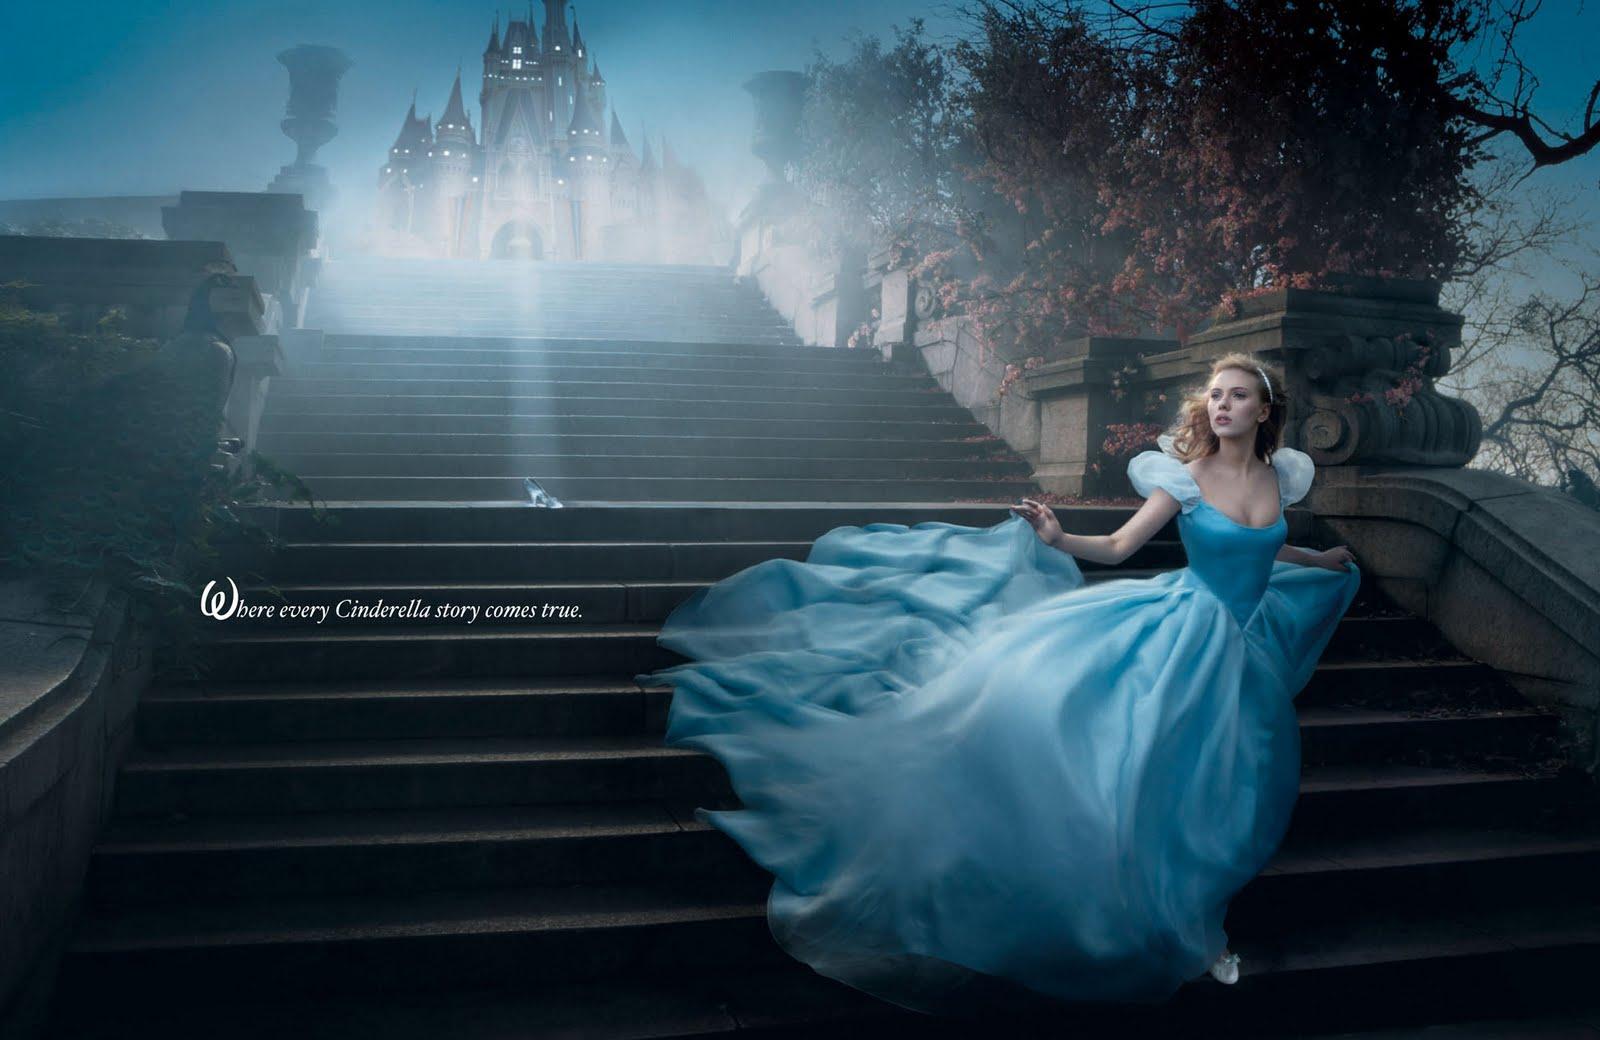 http://3.bp.blogspot.com/-4K1fk2VzQfw/TXV86LfHPtI/AAAAAAAAAB4/qBBZ7_g6tyo/s1600/Annie-Leibovitz-s-Disney-Dream-Portrait-Series-disney-1361373-2000-1300.jpg